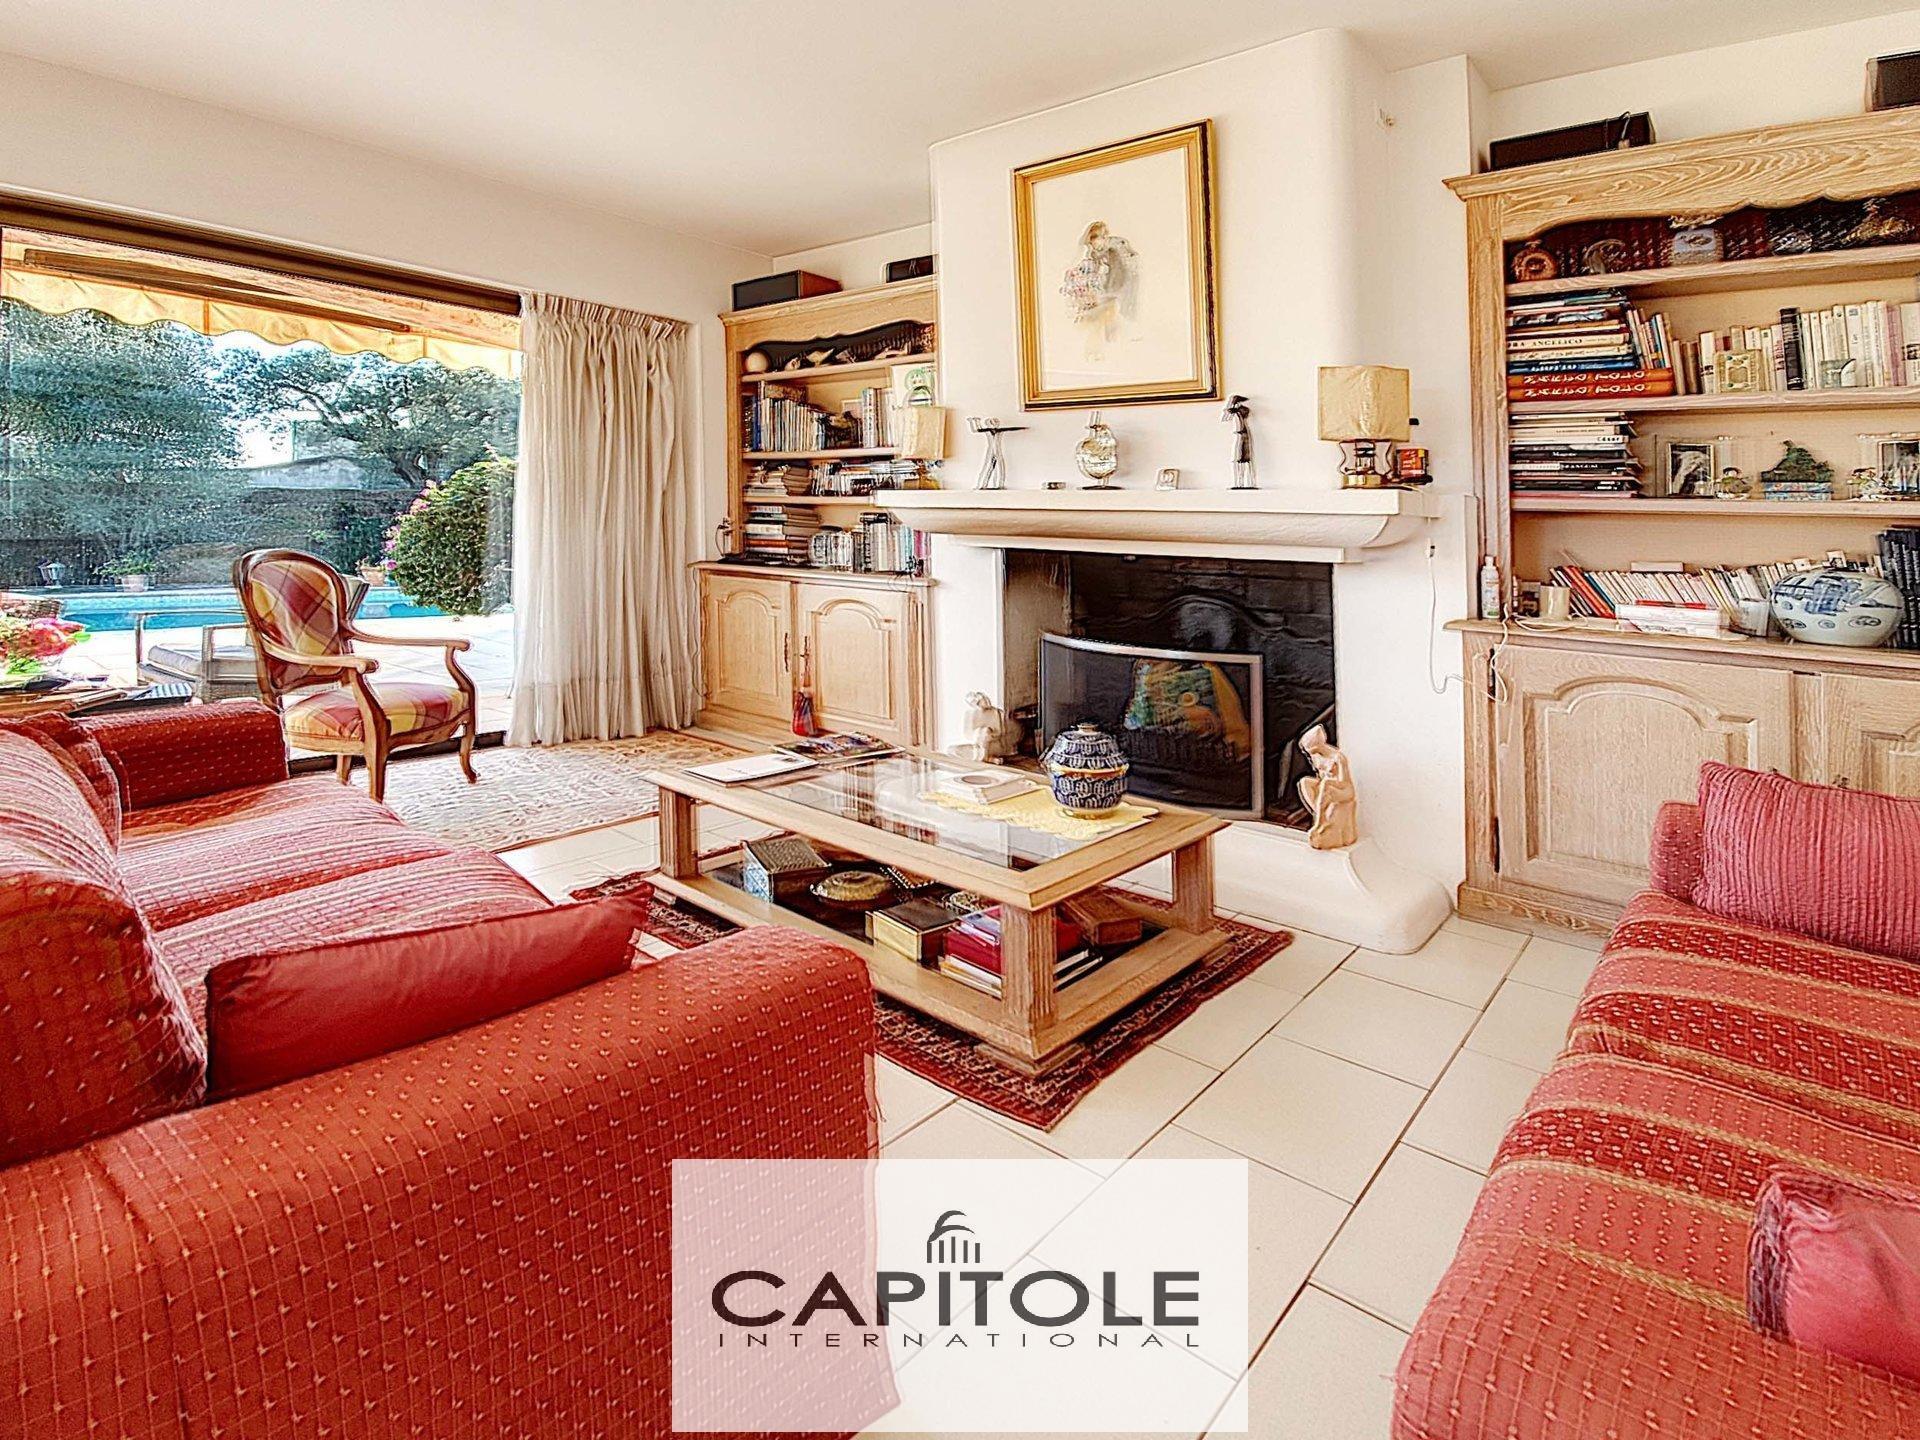 A vendre, Antibes, VILLA 200 M², PISCINE, jardin paysager,